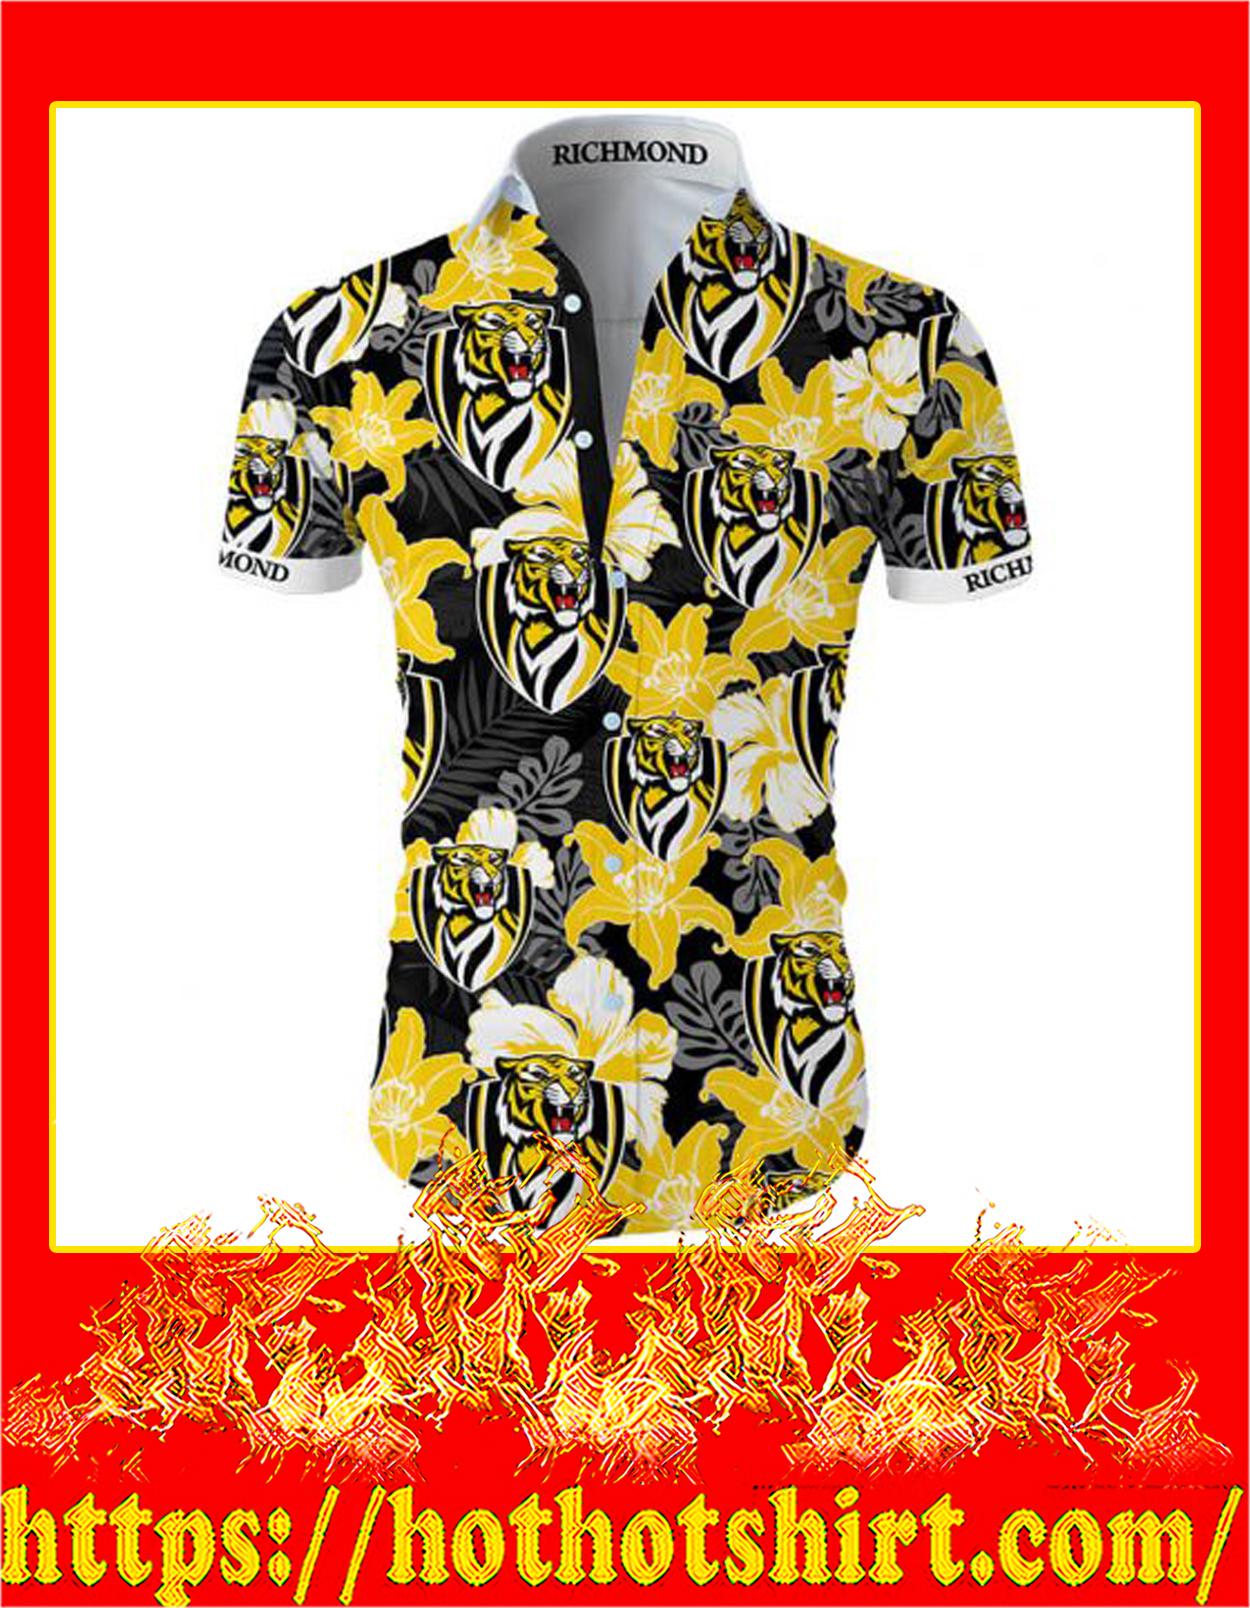 Richmond football club hawaiian shirt - front